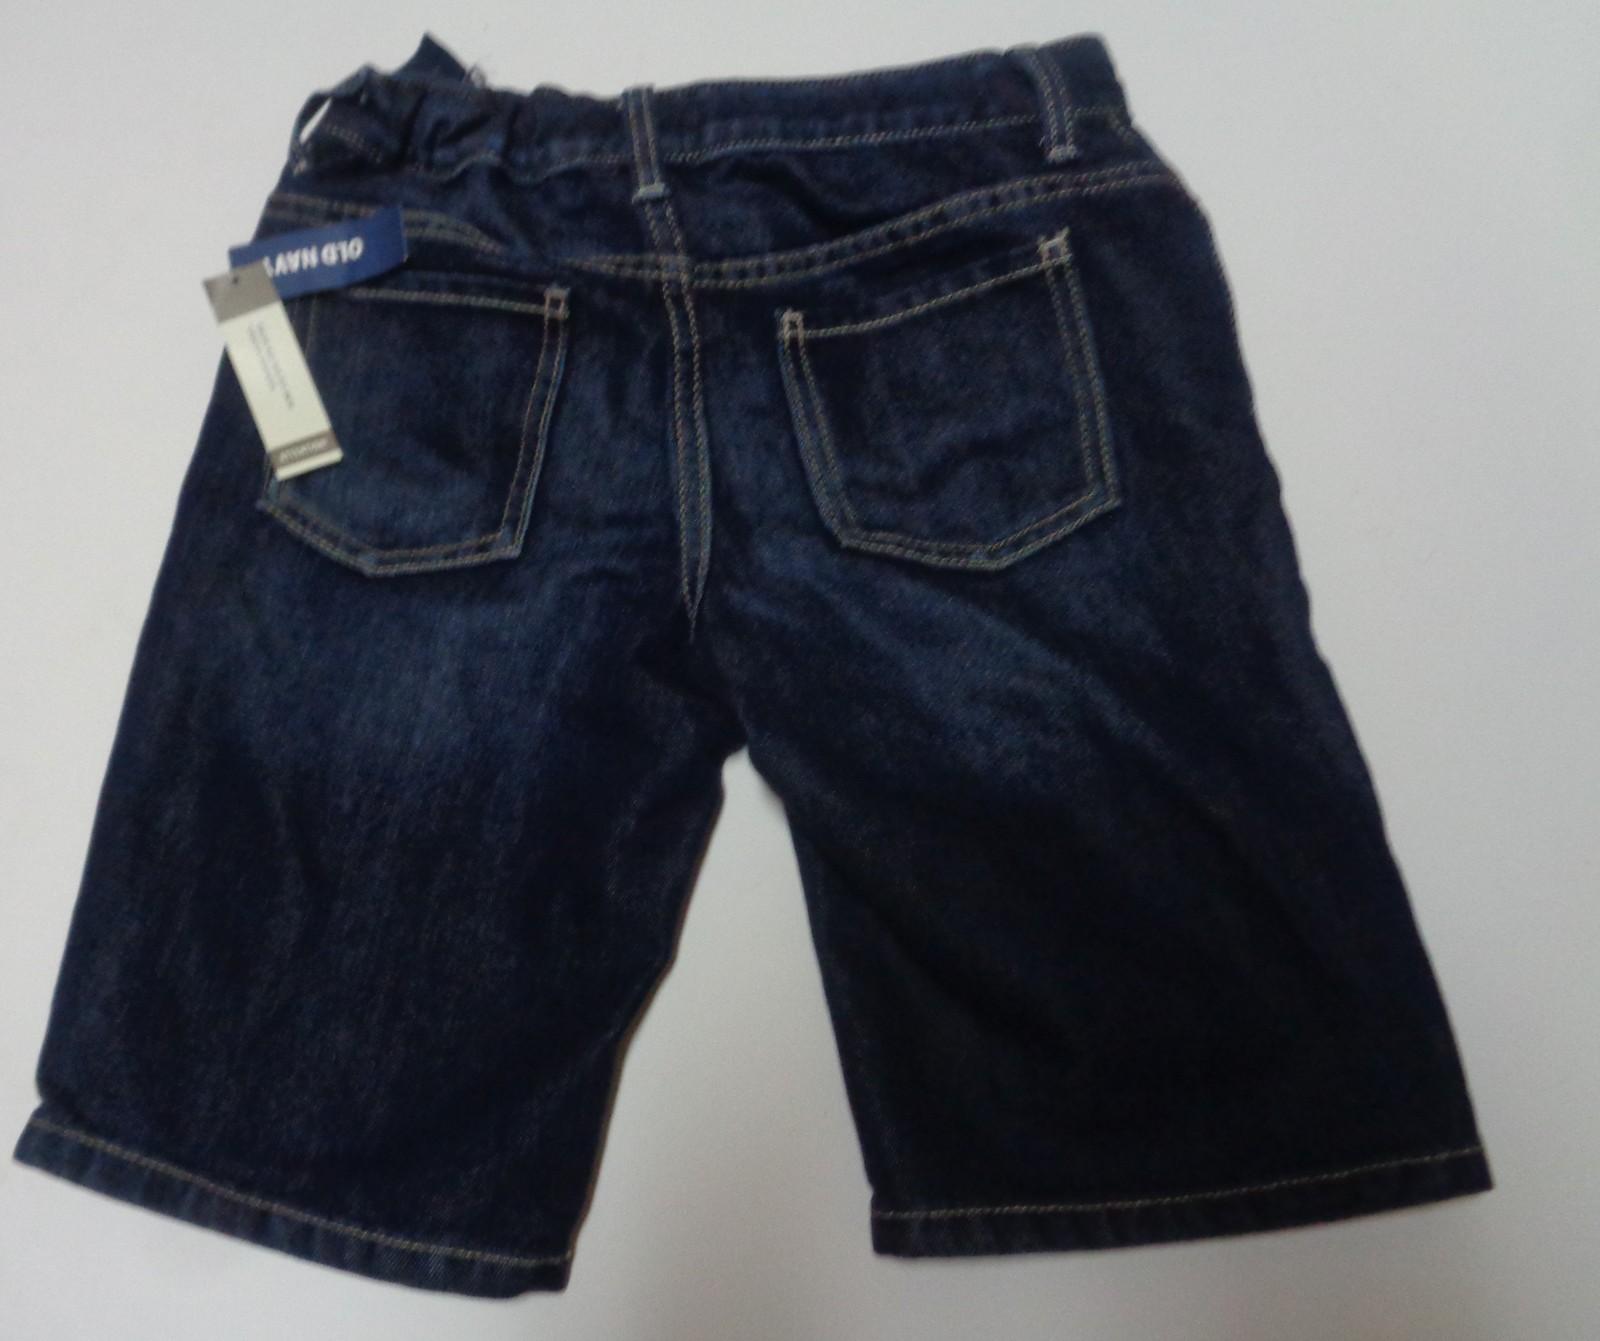 Old Navy Blue Jean Boarding Shorts NWT Sz 12R